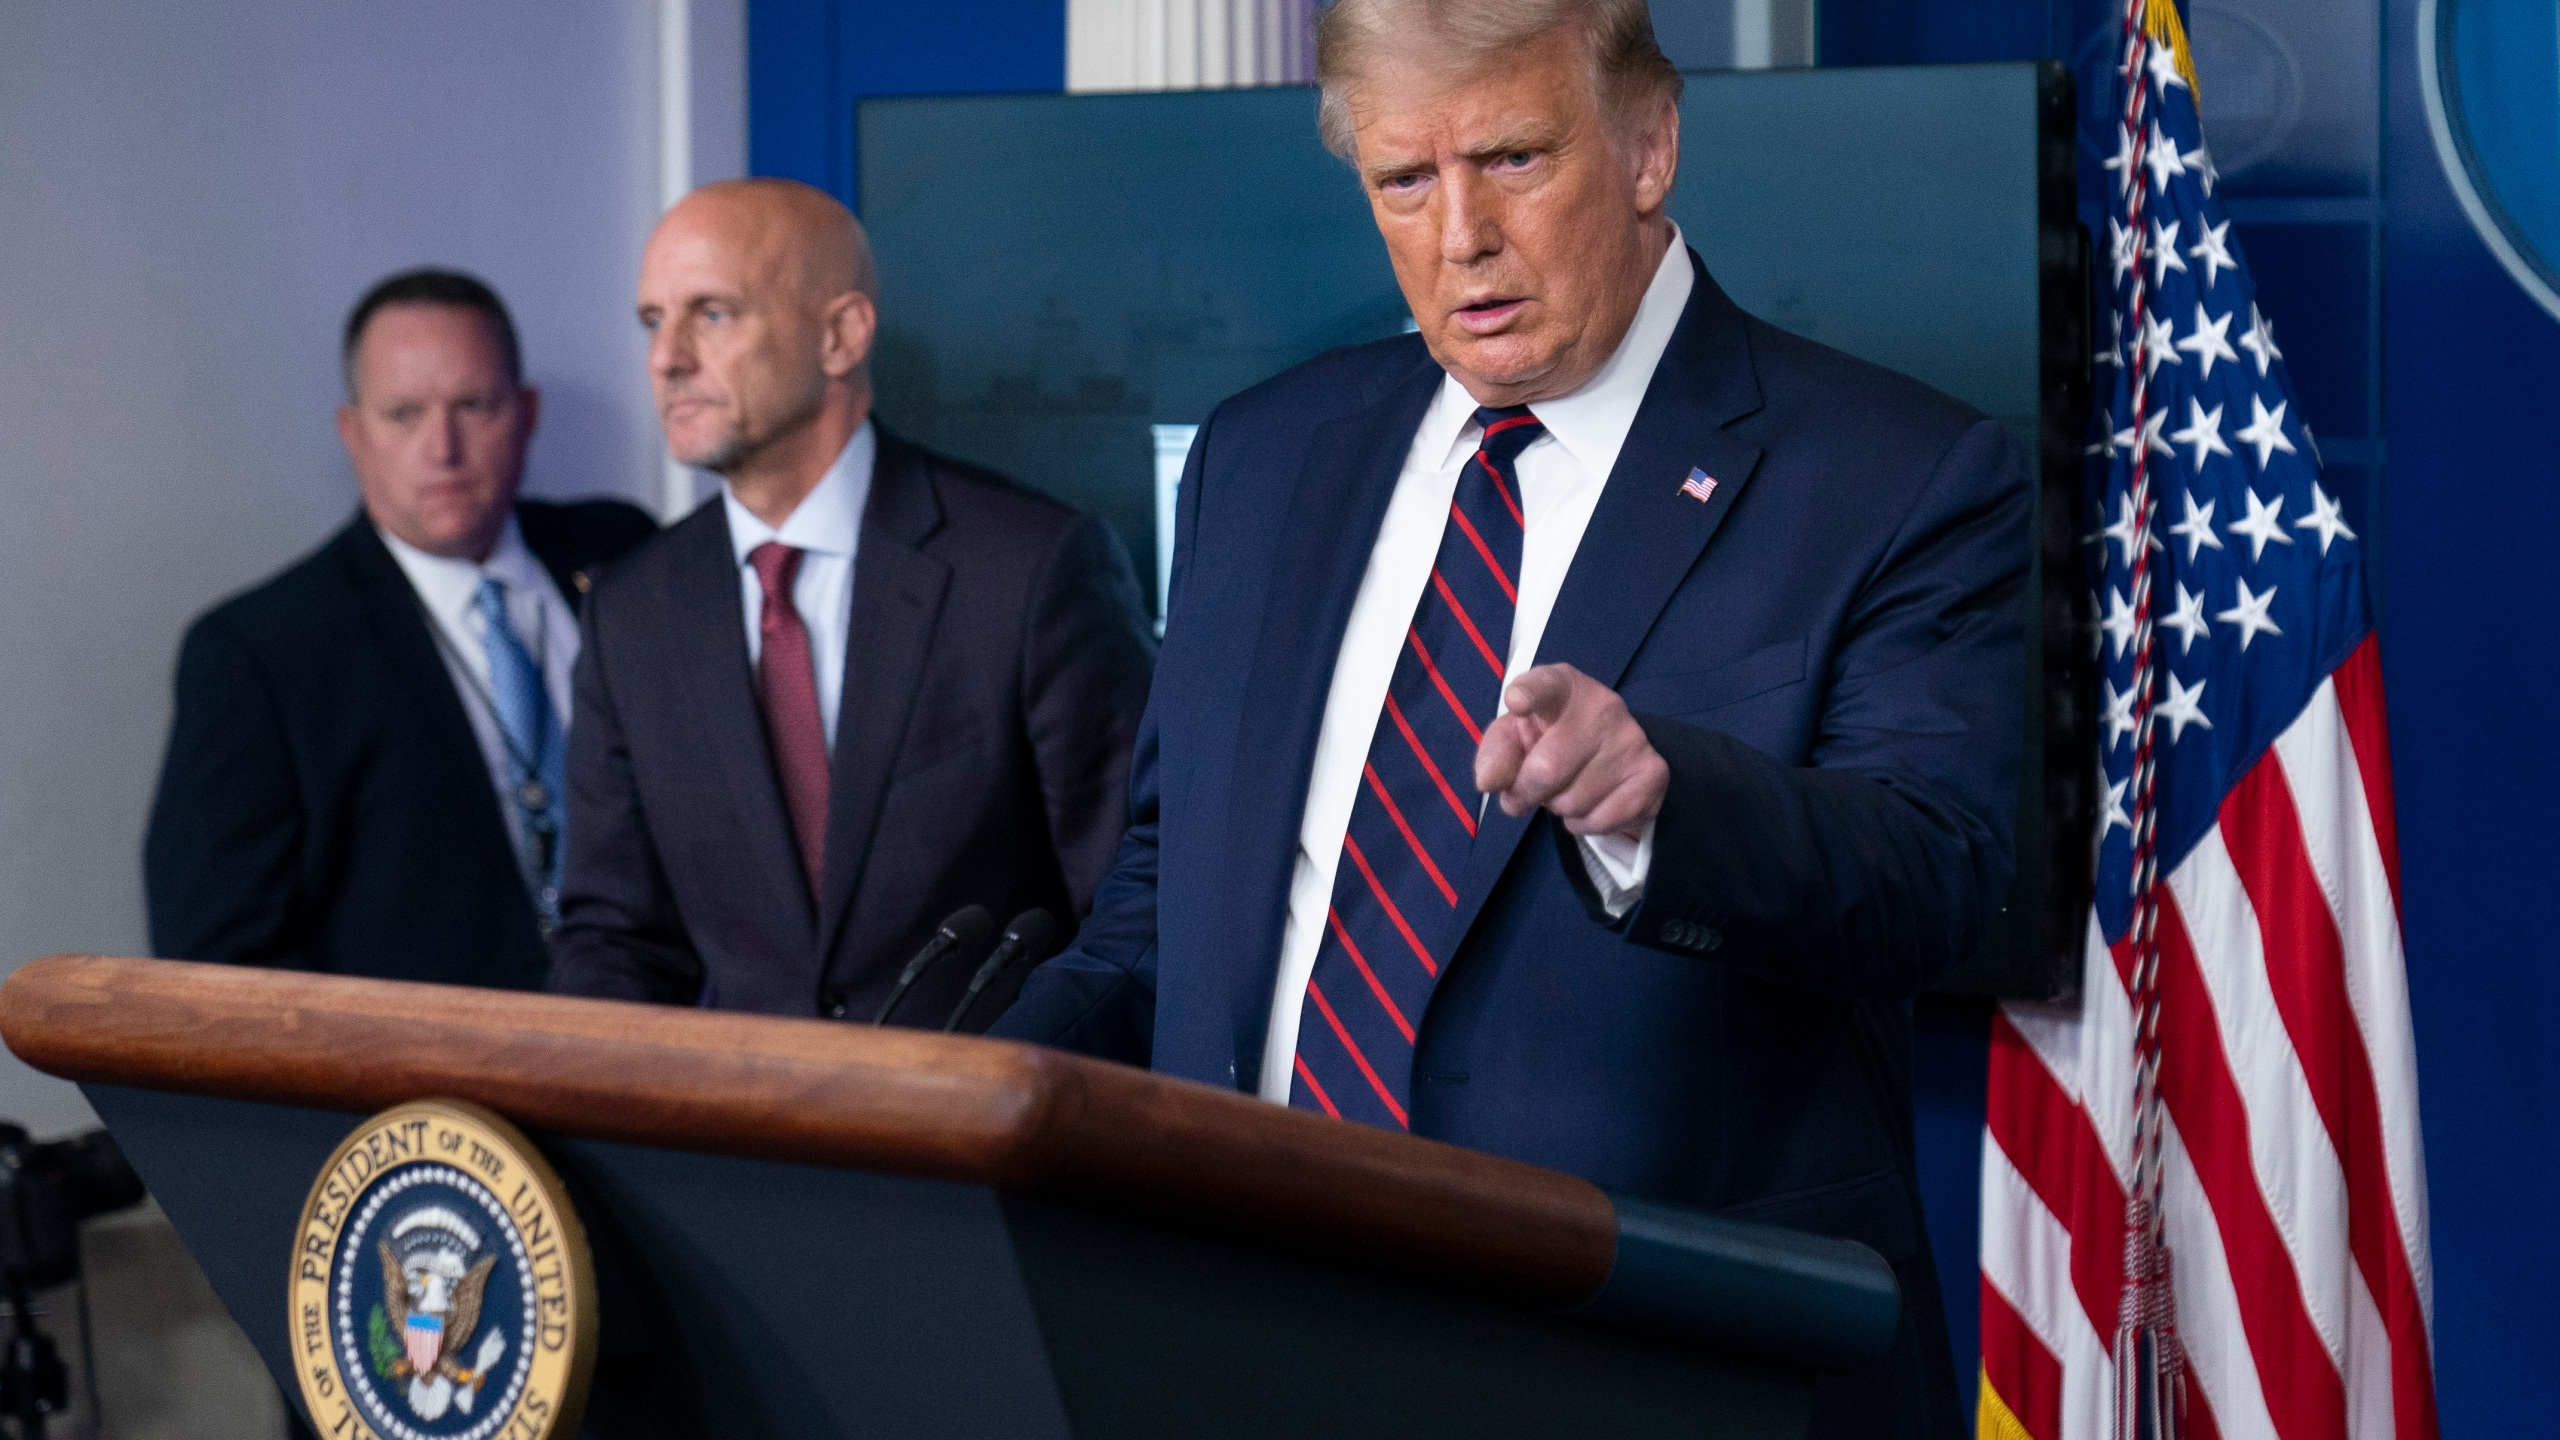 Donald Trump, Stephen Hahn